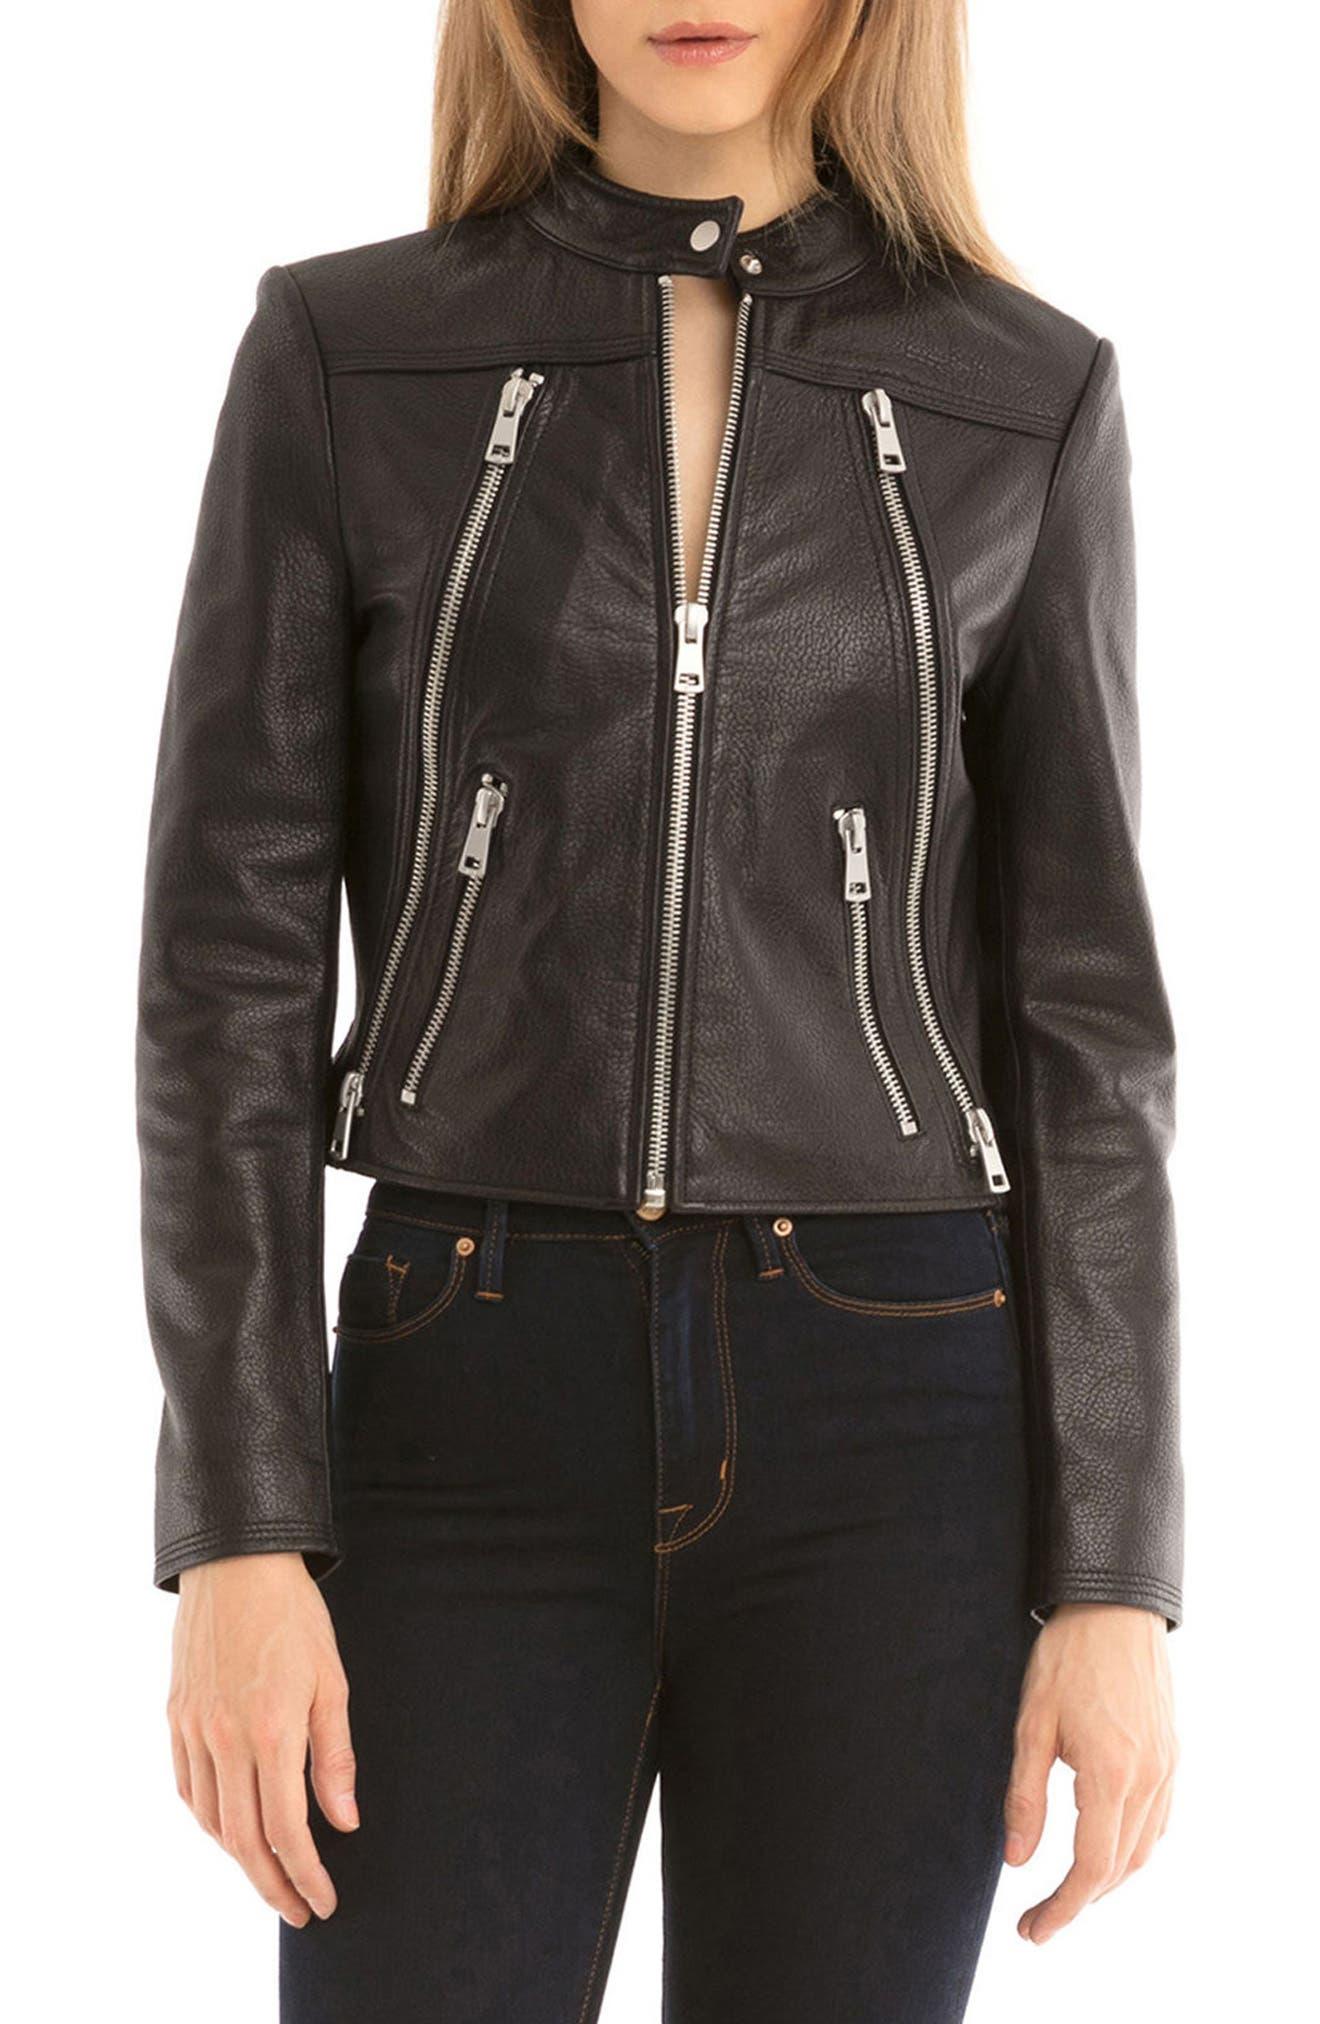 Bagatelle Textured Leather Jacket,                             Alternate thumbnail 5, color,                             001